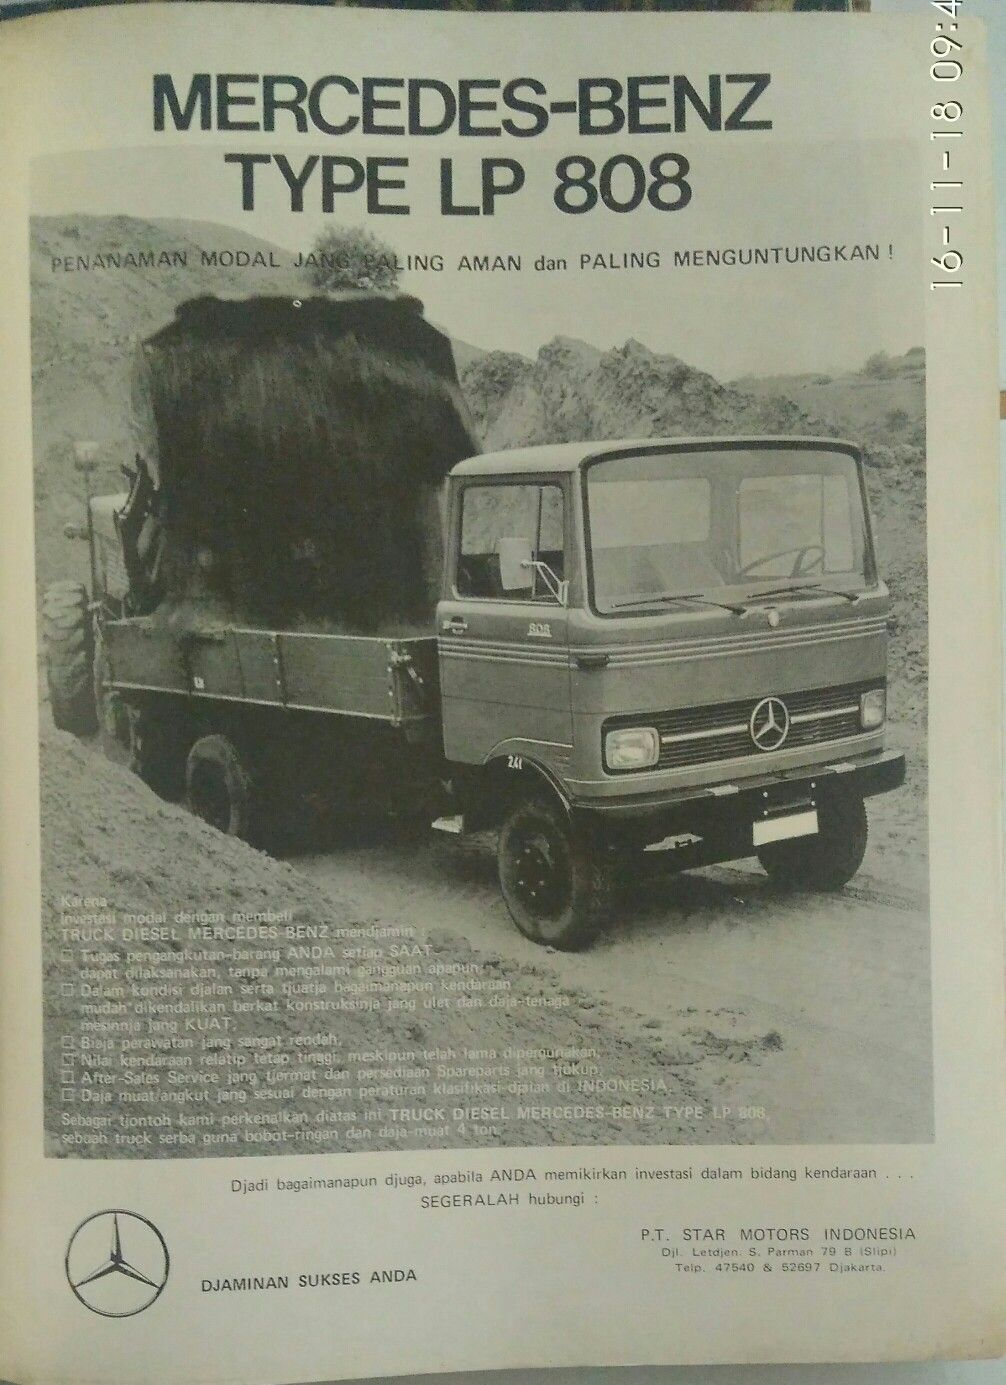 Iklan Mercedez Benz Lp 808 Dengan Gambar Mercedes Benz